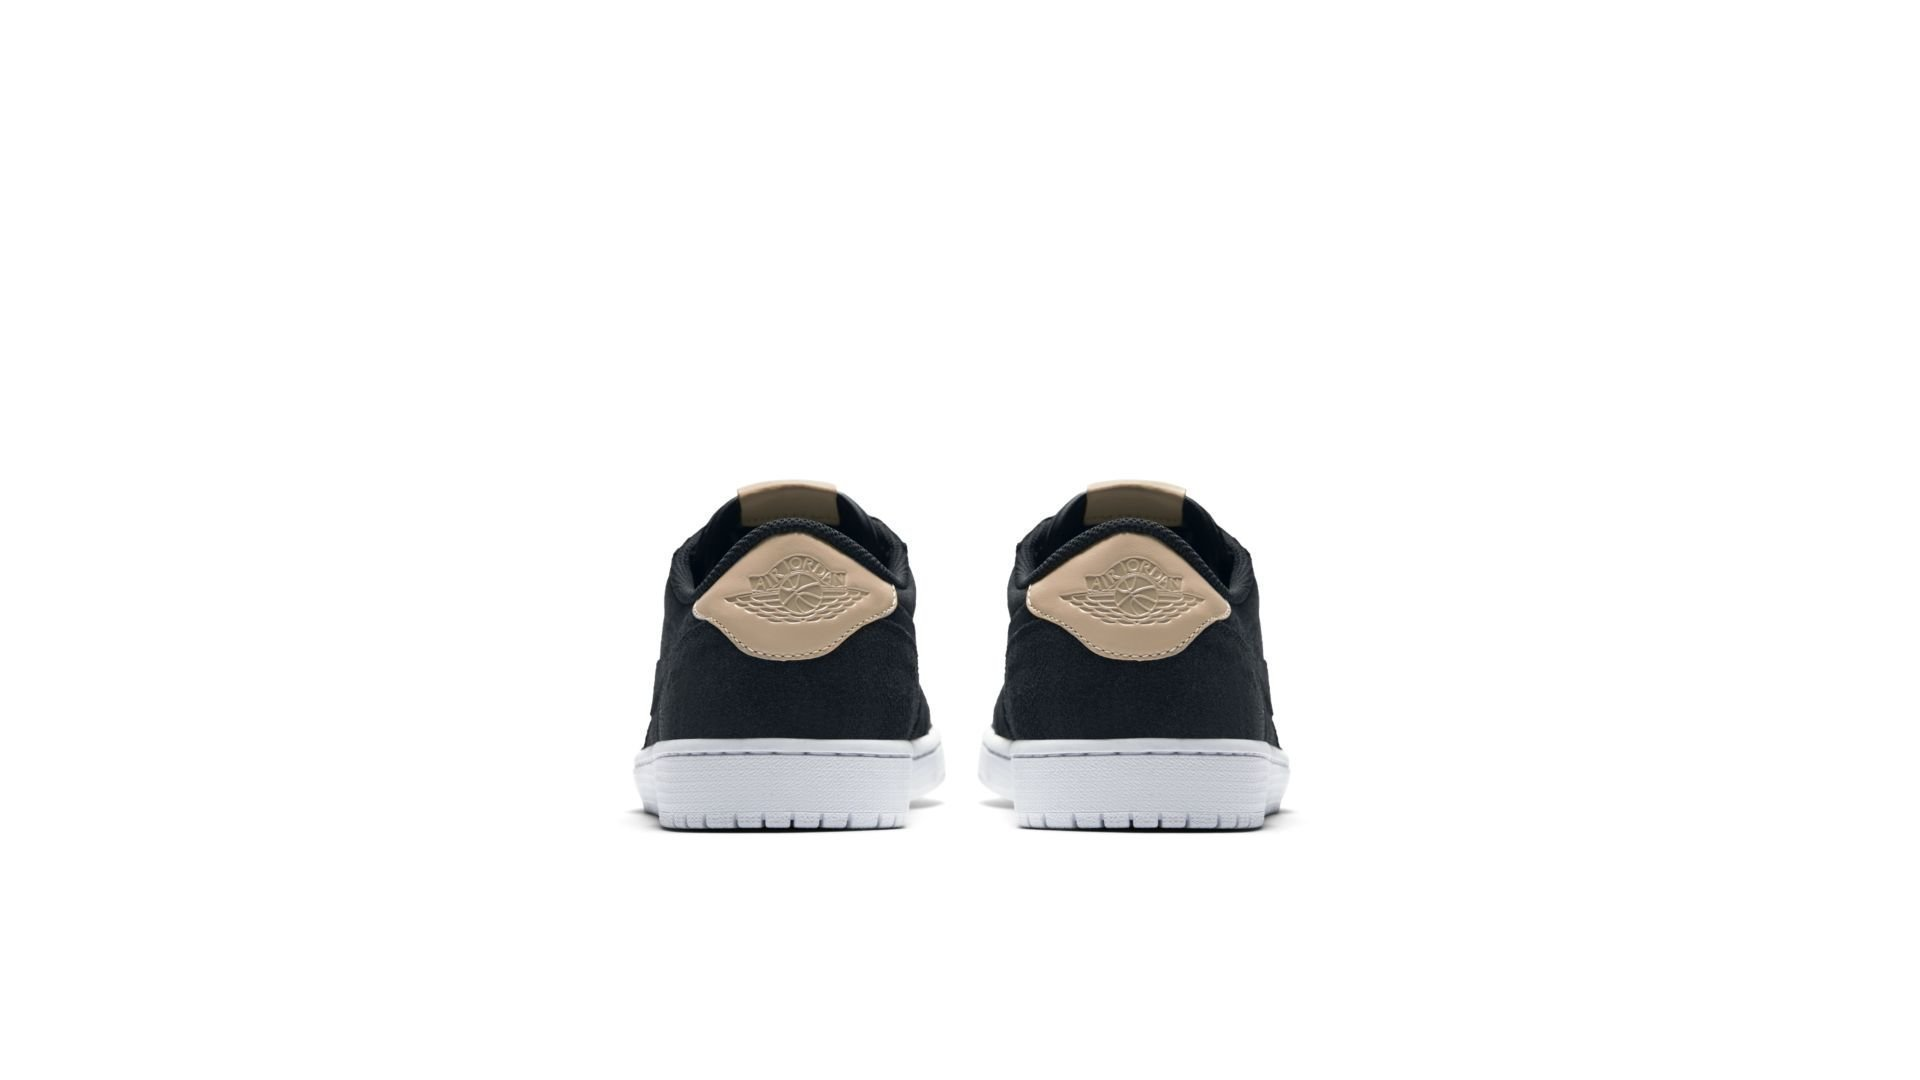 Jordan 1 Retro Low OG Black Vachetta (905136-010)